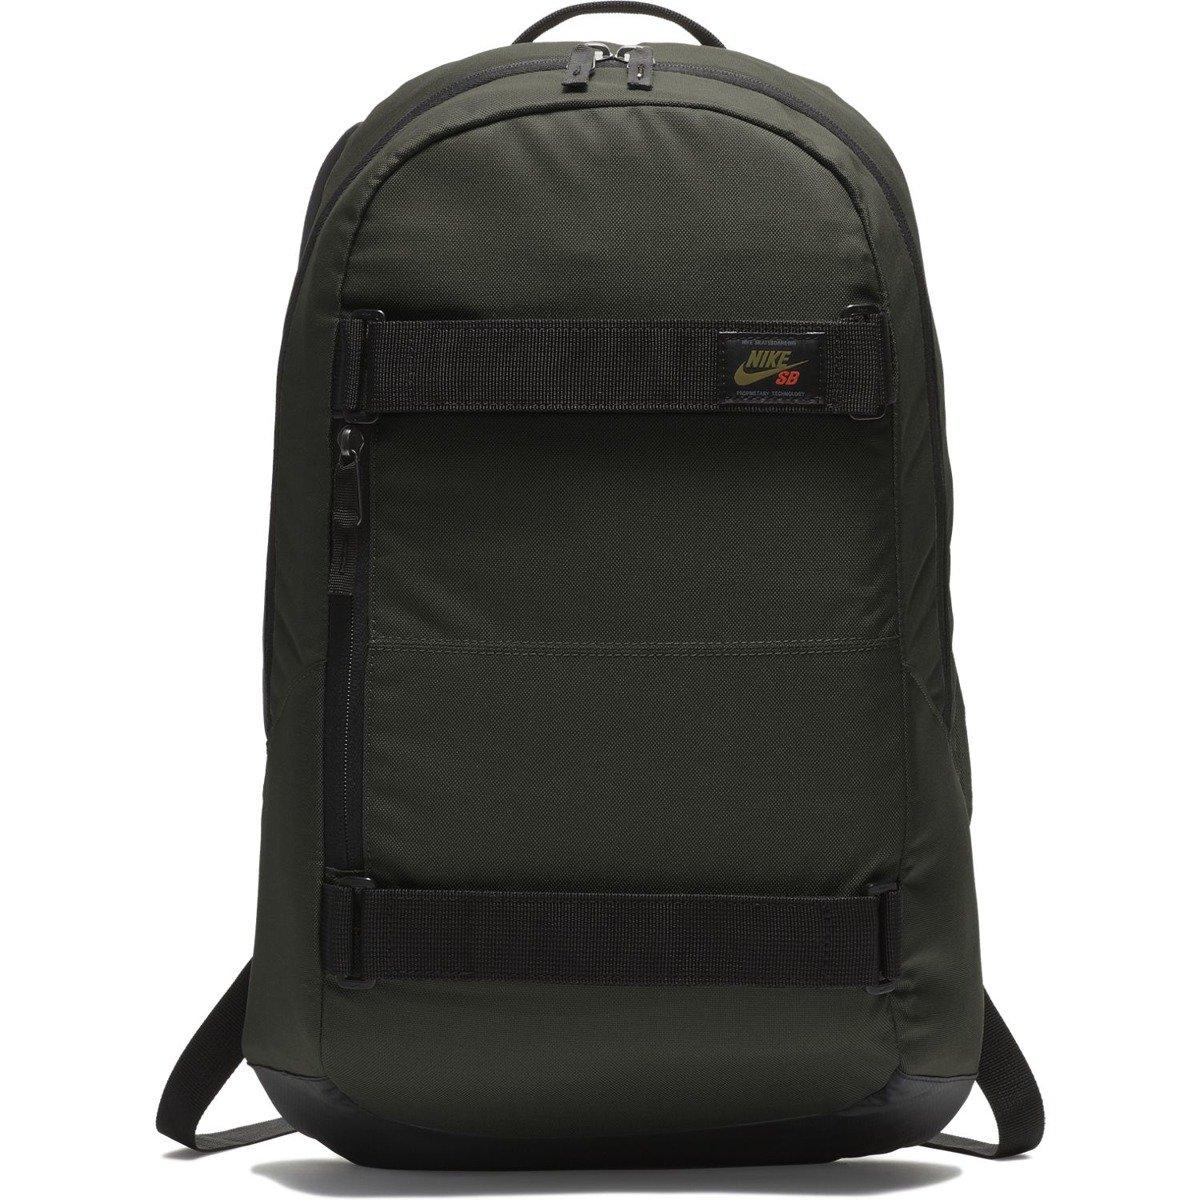 ab9af262b8cfd nike sb Courthouse Sequoia/black/olive Flak   Accesories \ Backpacks Brands  \ Nike SB   Skateshop Miniramp.pl